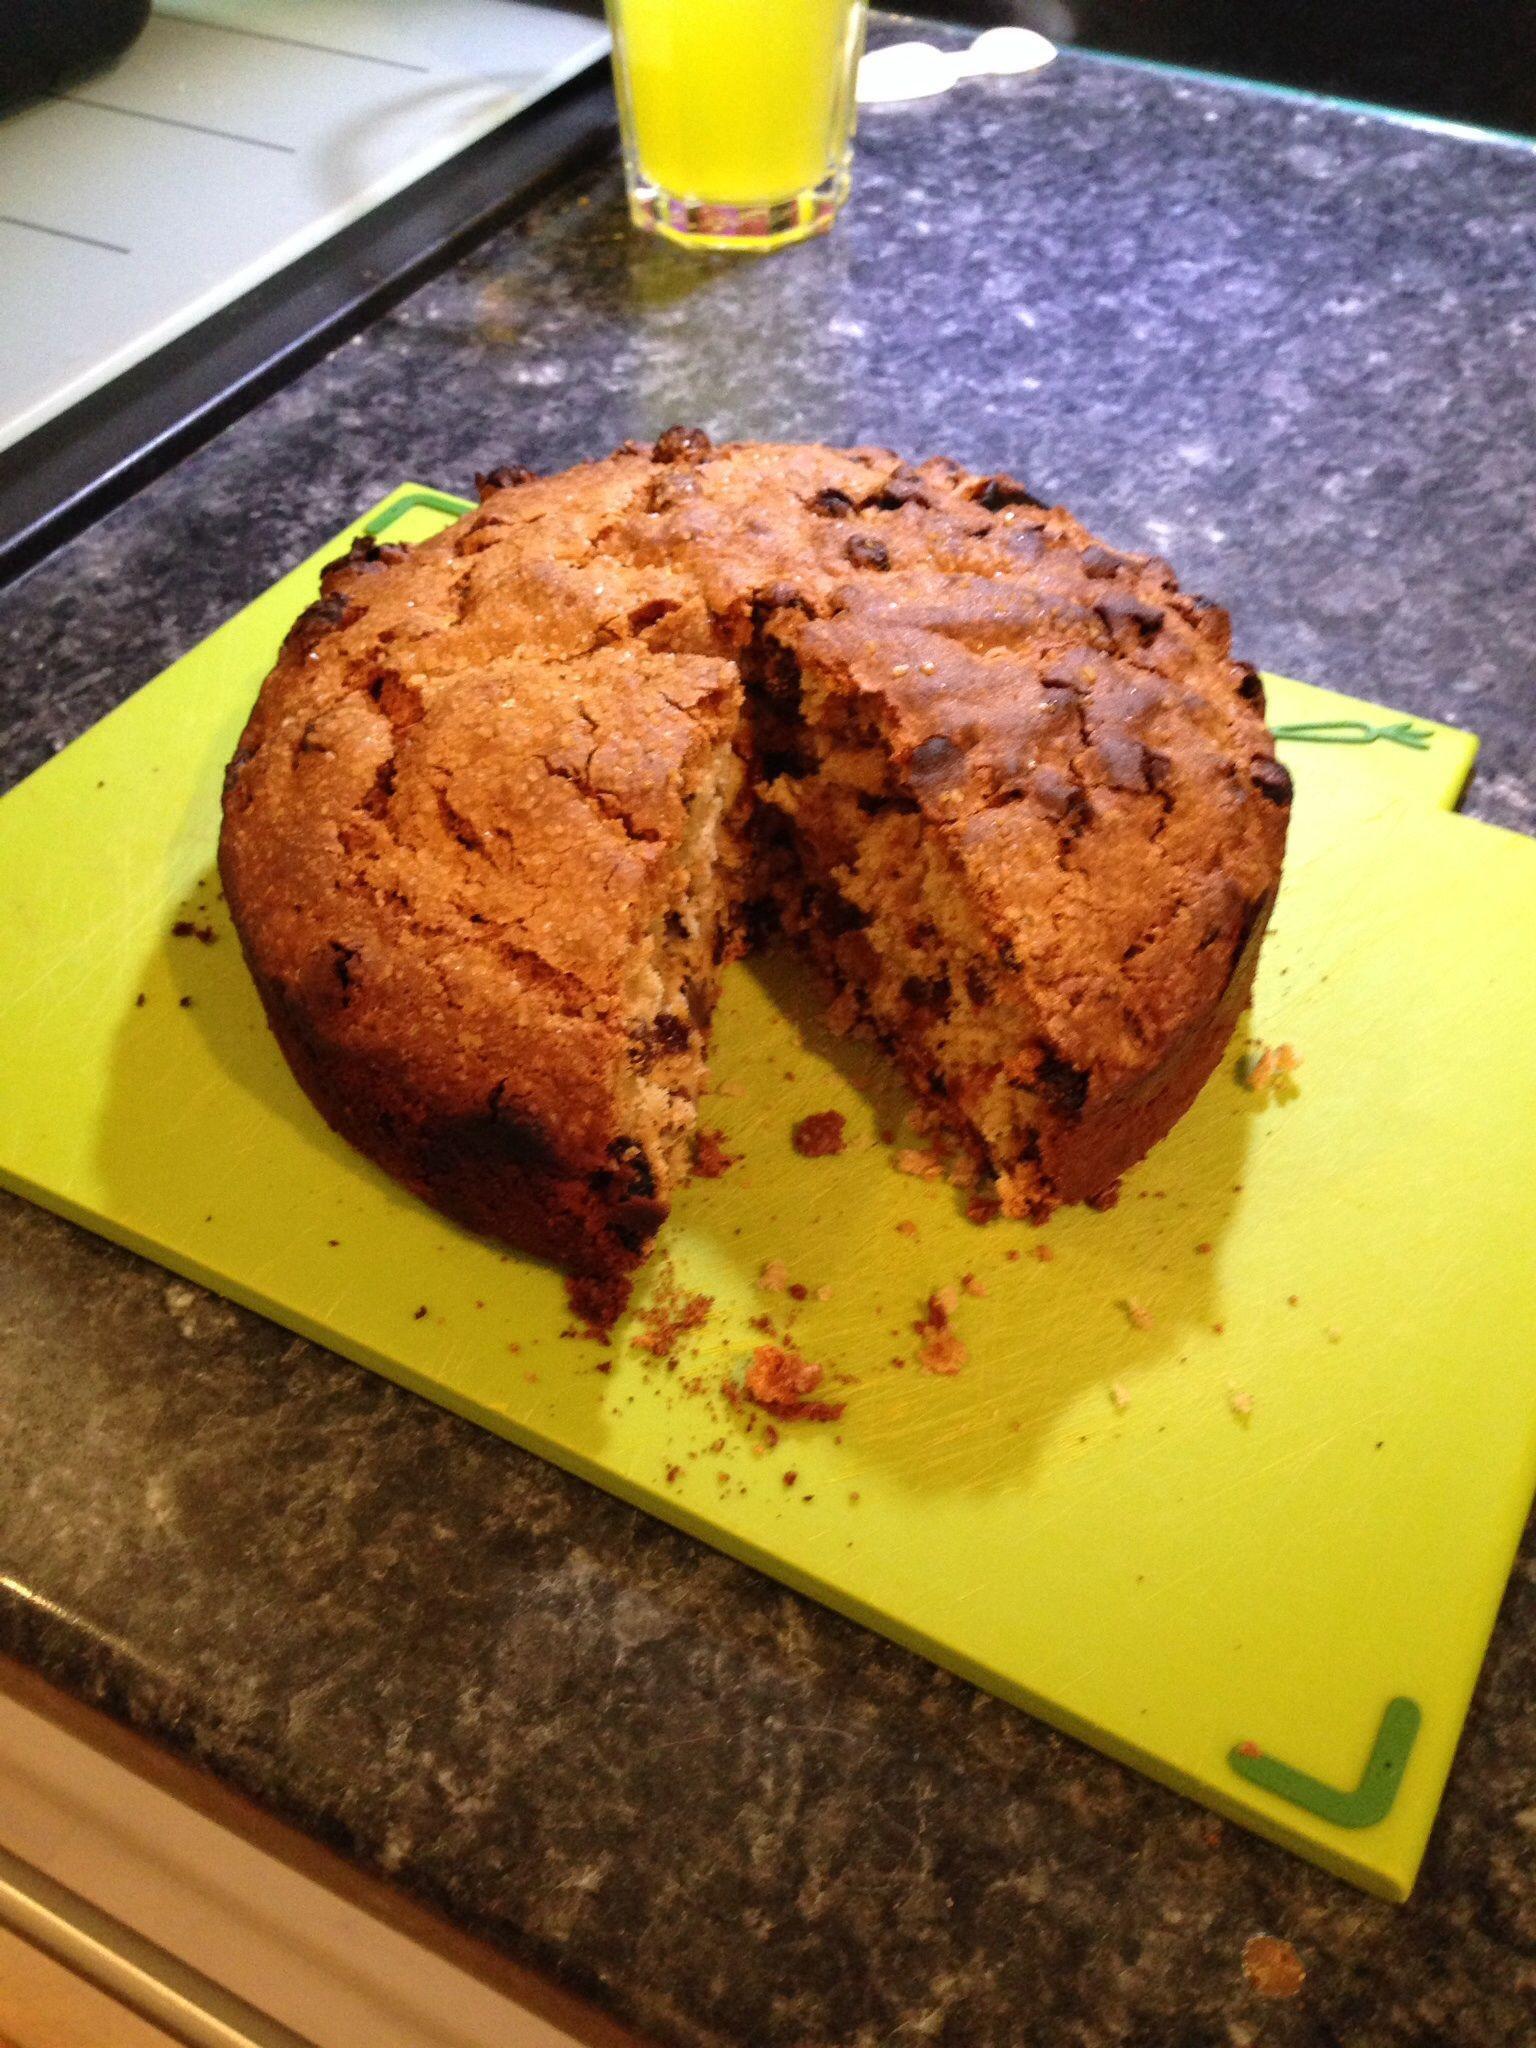 Fruit Cake Recipe  Quick & Easy Fruit Cake recipe All recipes UK